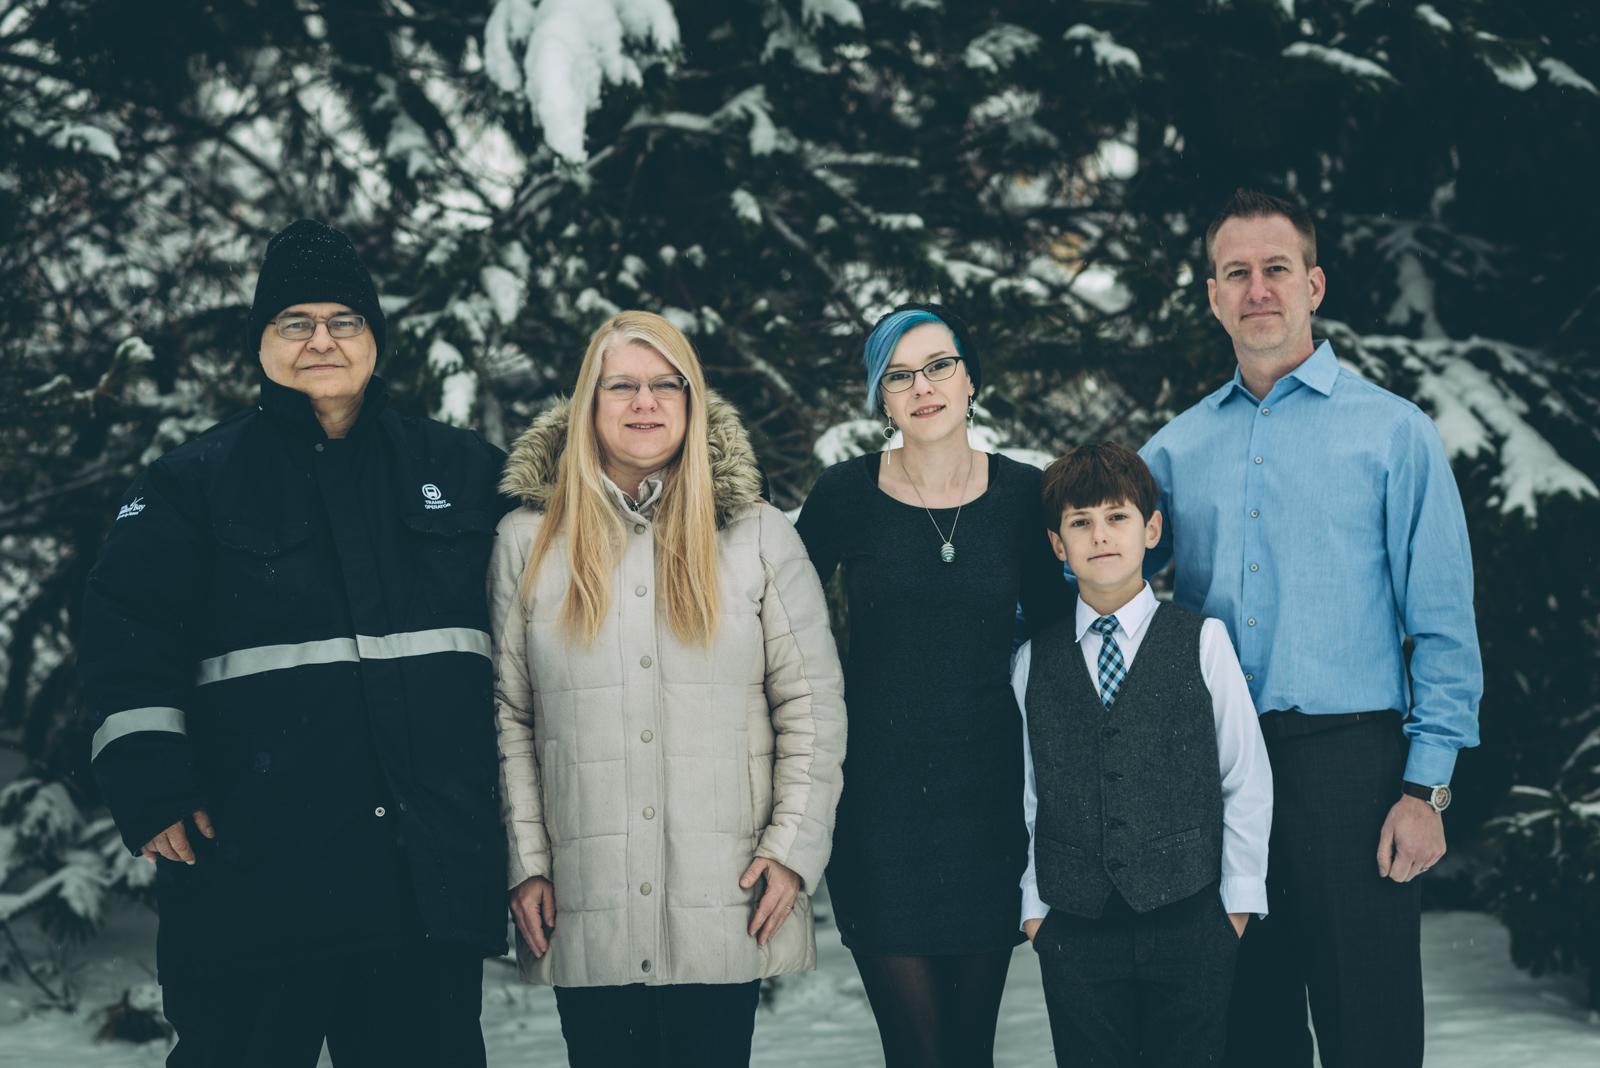 ashlyn-family-portraits-blog-16.jpg